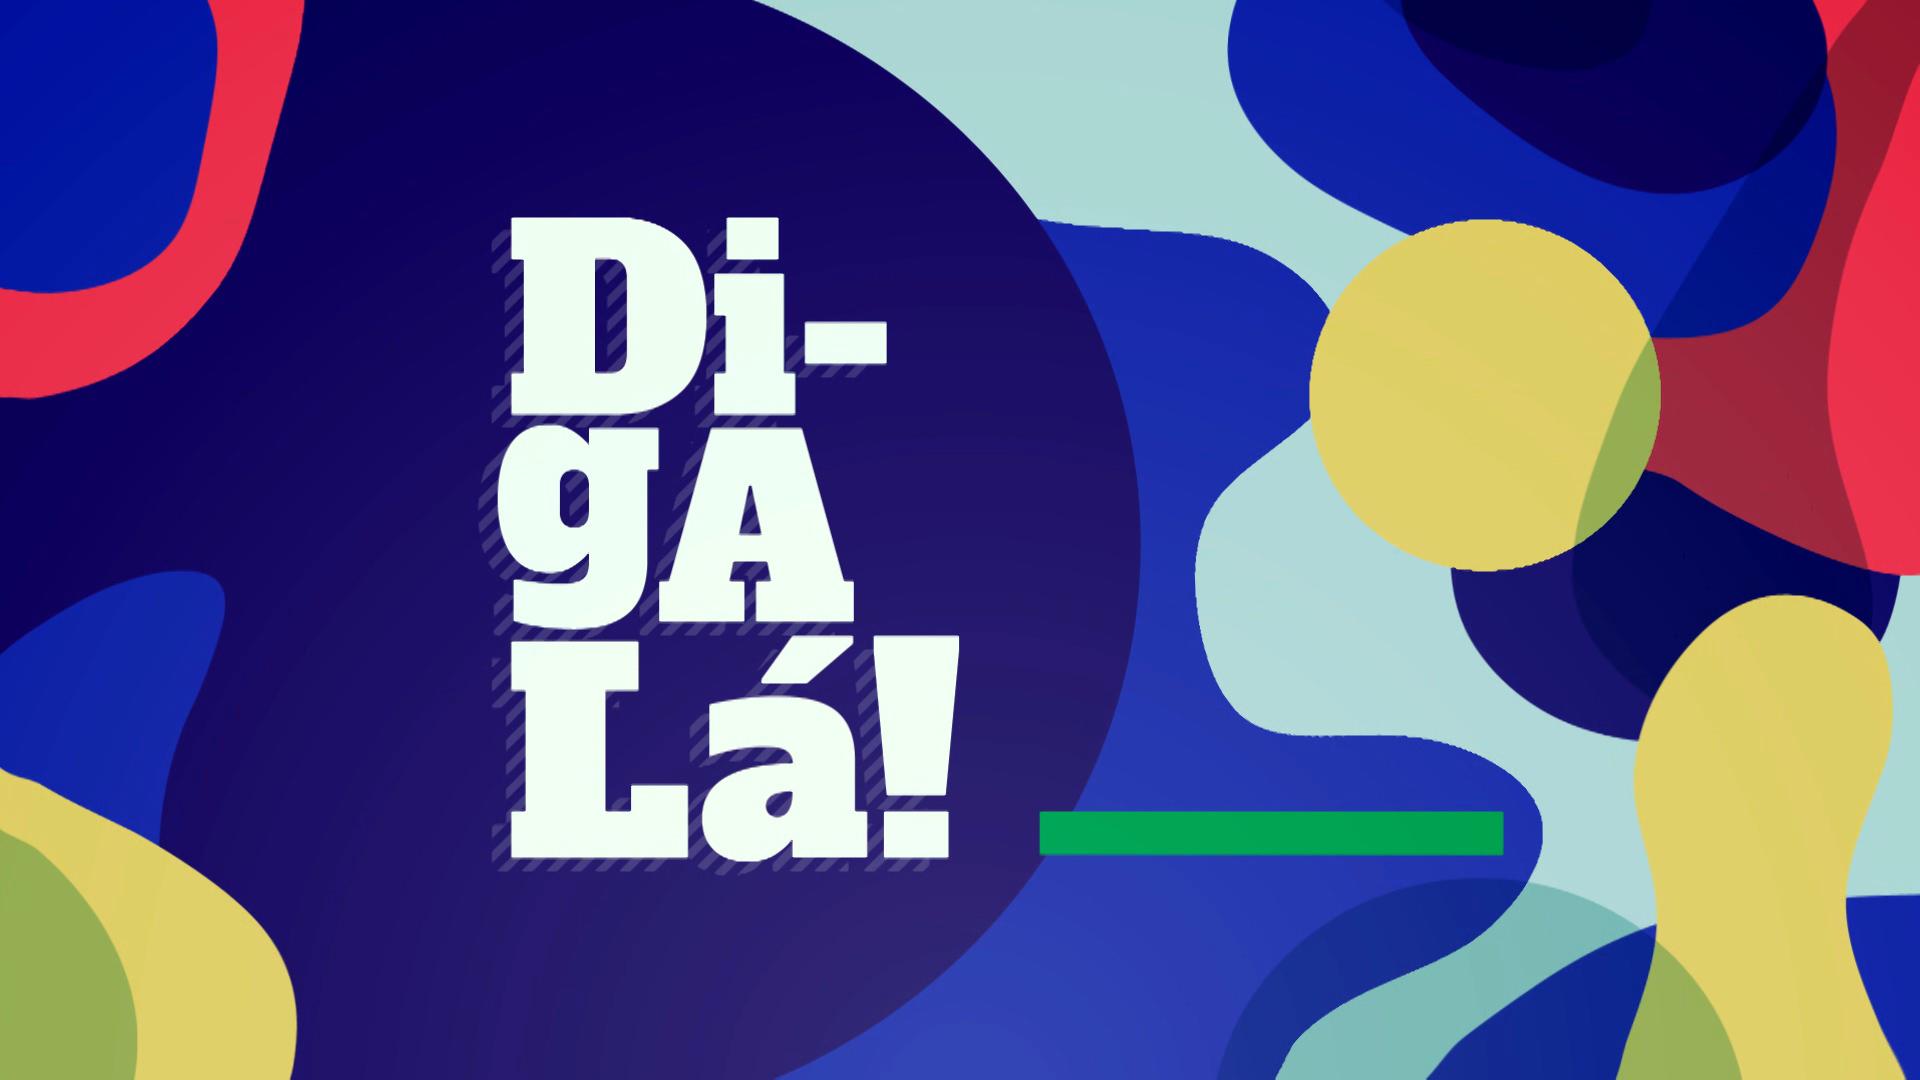 Diga Lá